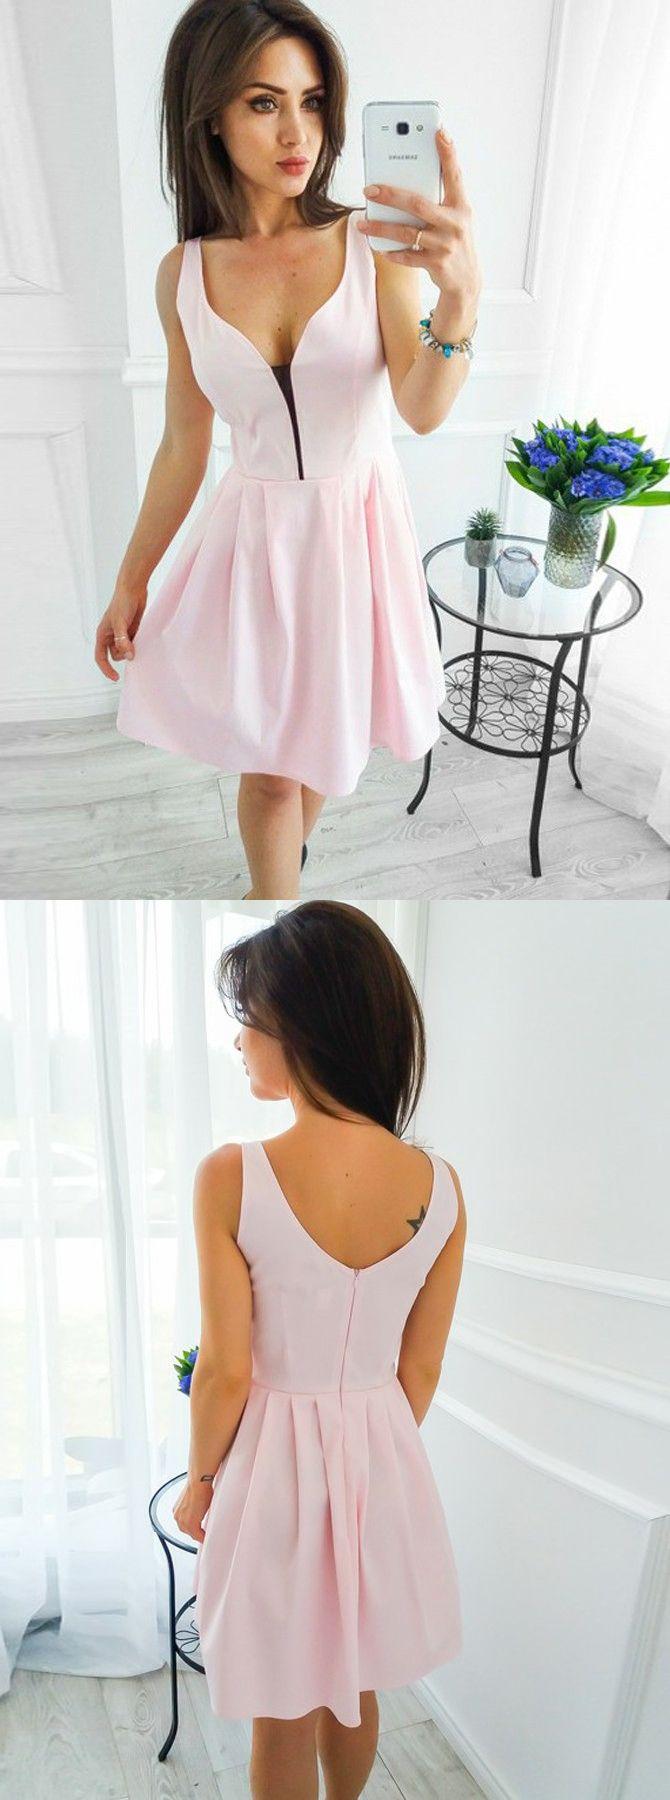 Pink short homecoming dressessimple chiffon prom dresscheap prty